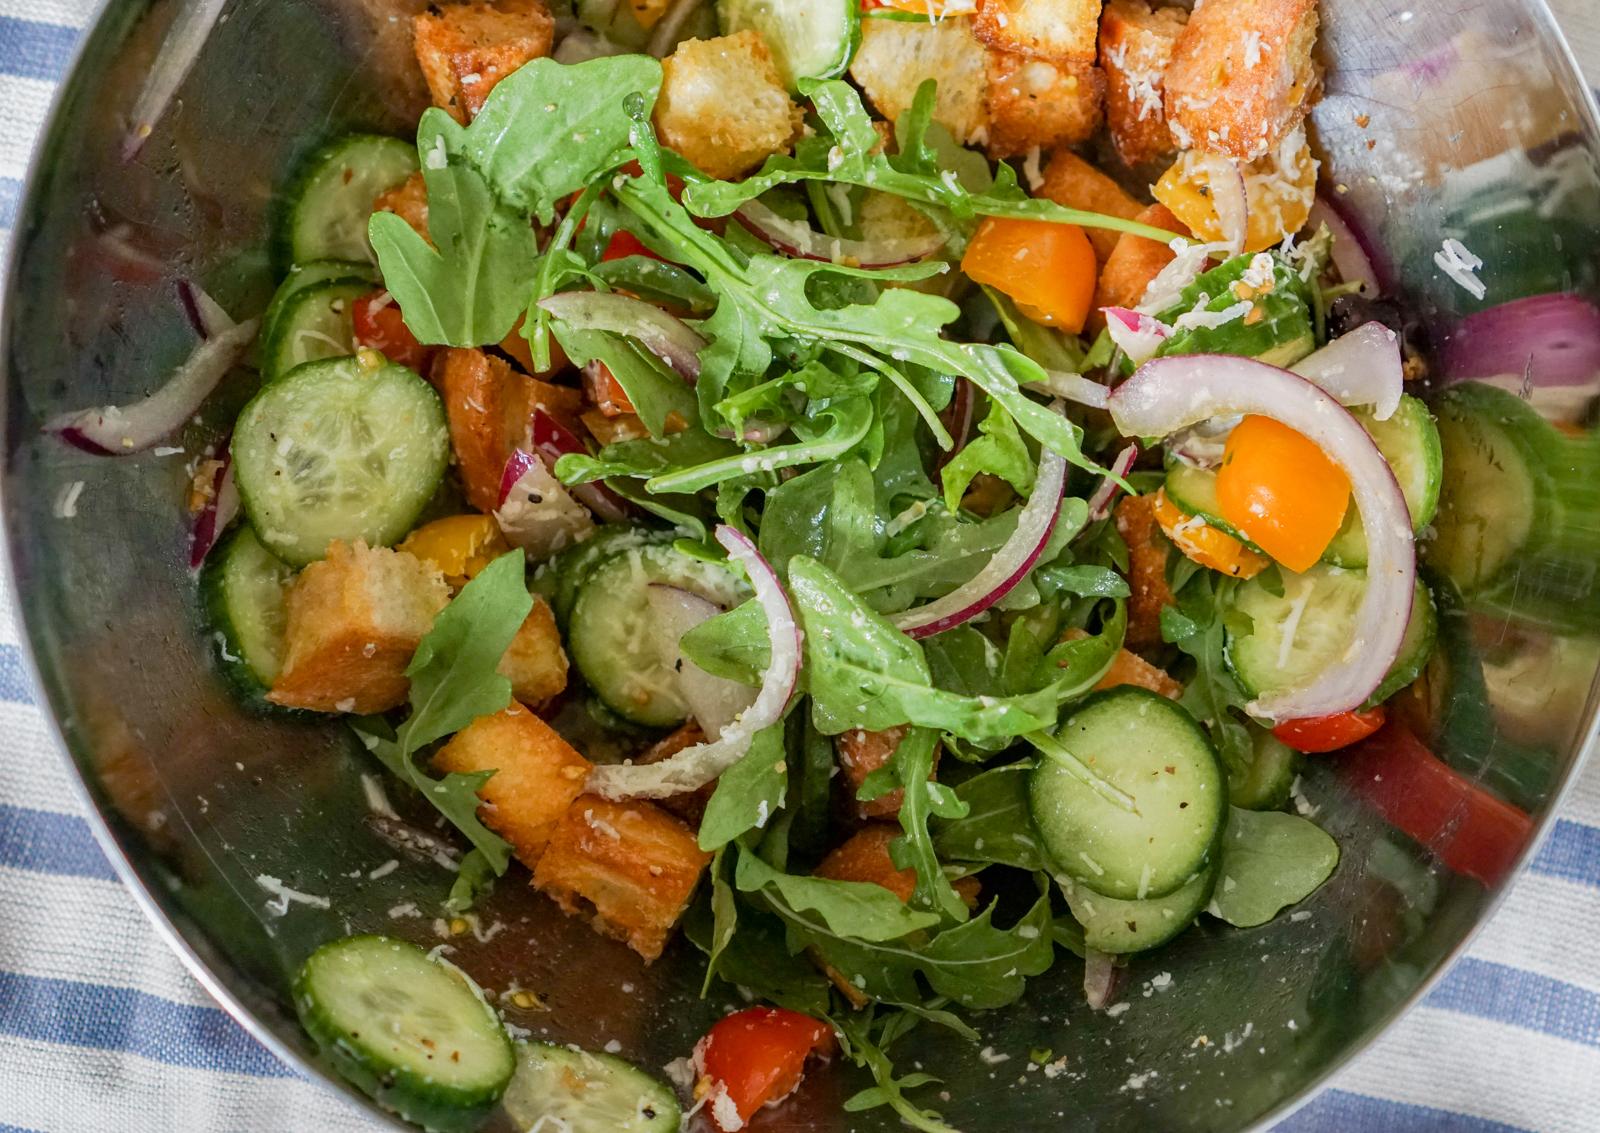 Arugula Panzanella-Inspired Salad